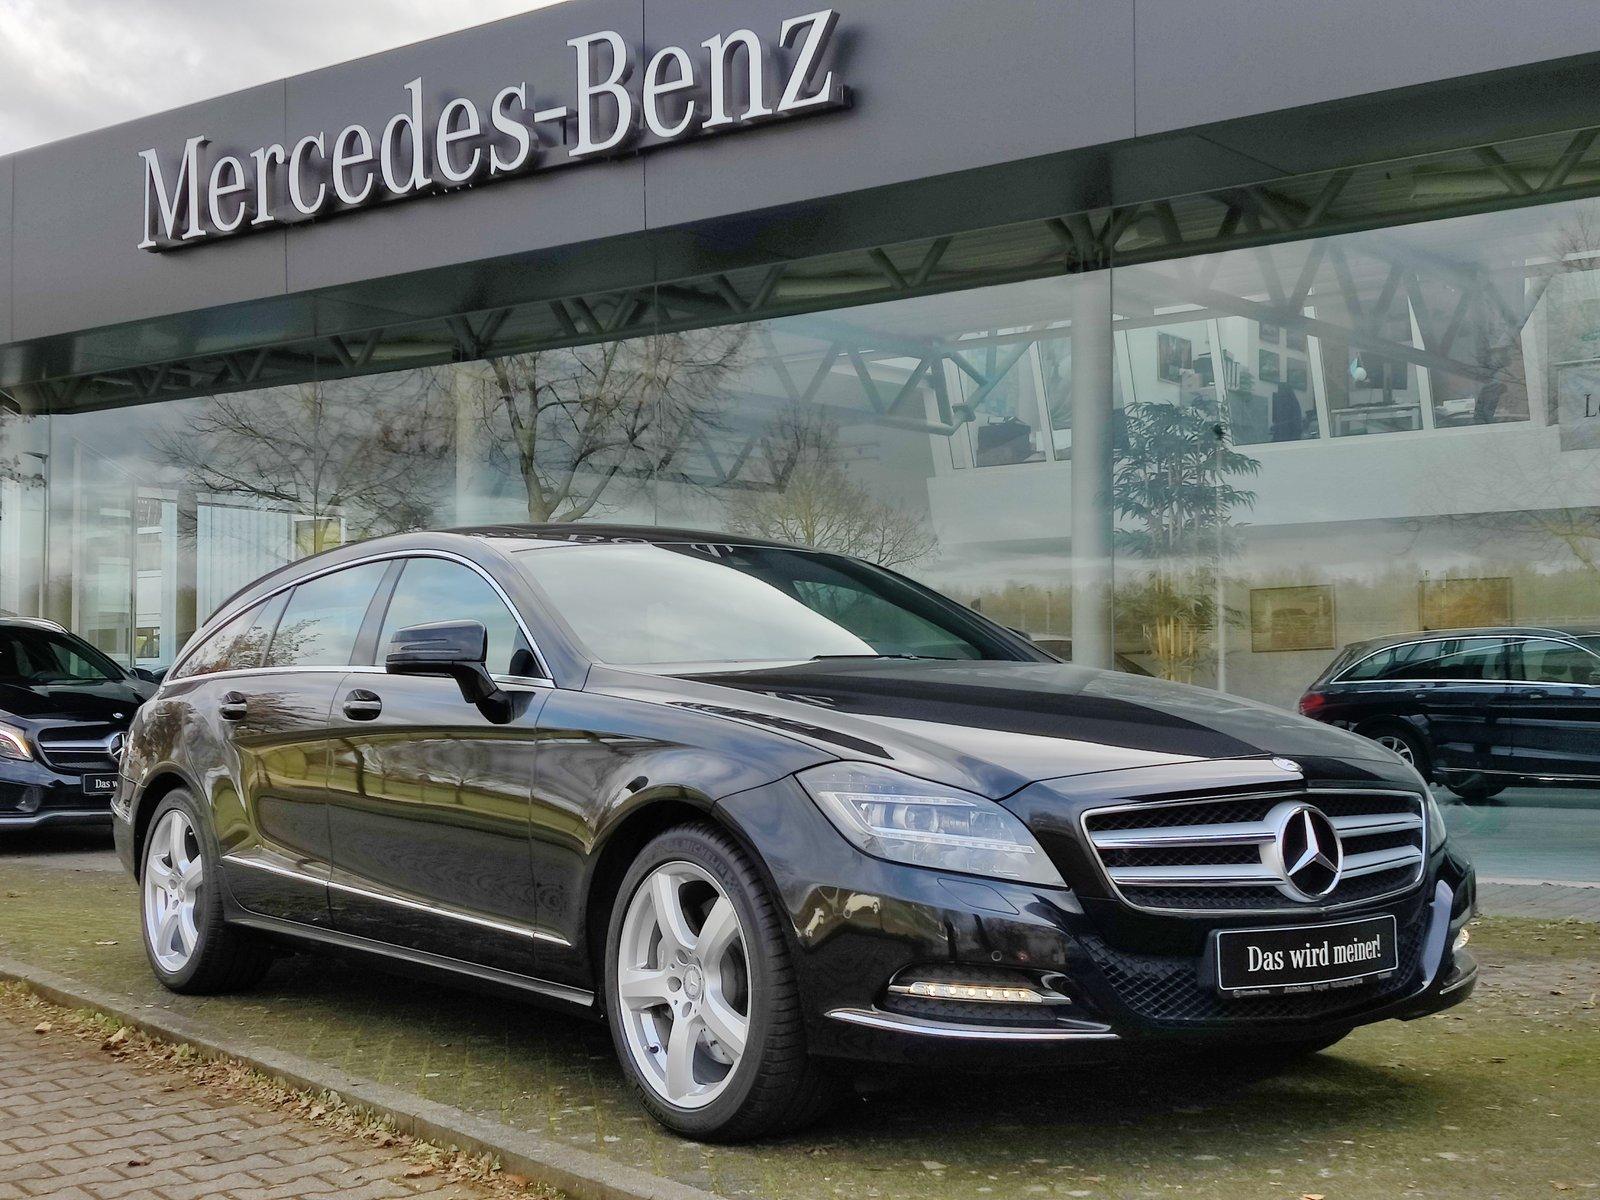 Mercedes-Benz CLS 350 CDI SB|Harmon&Kard.|Comand|LED|Sitzklima, Jahr 2014, Diesel